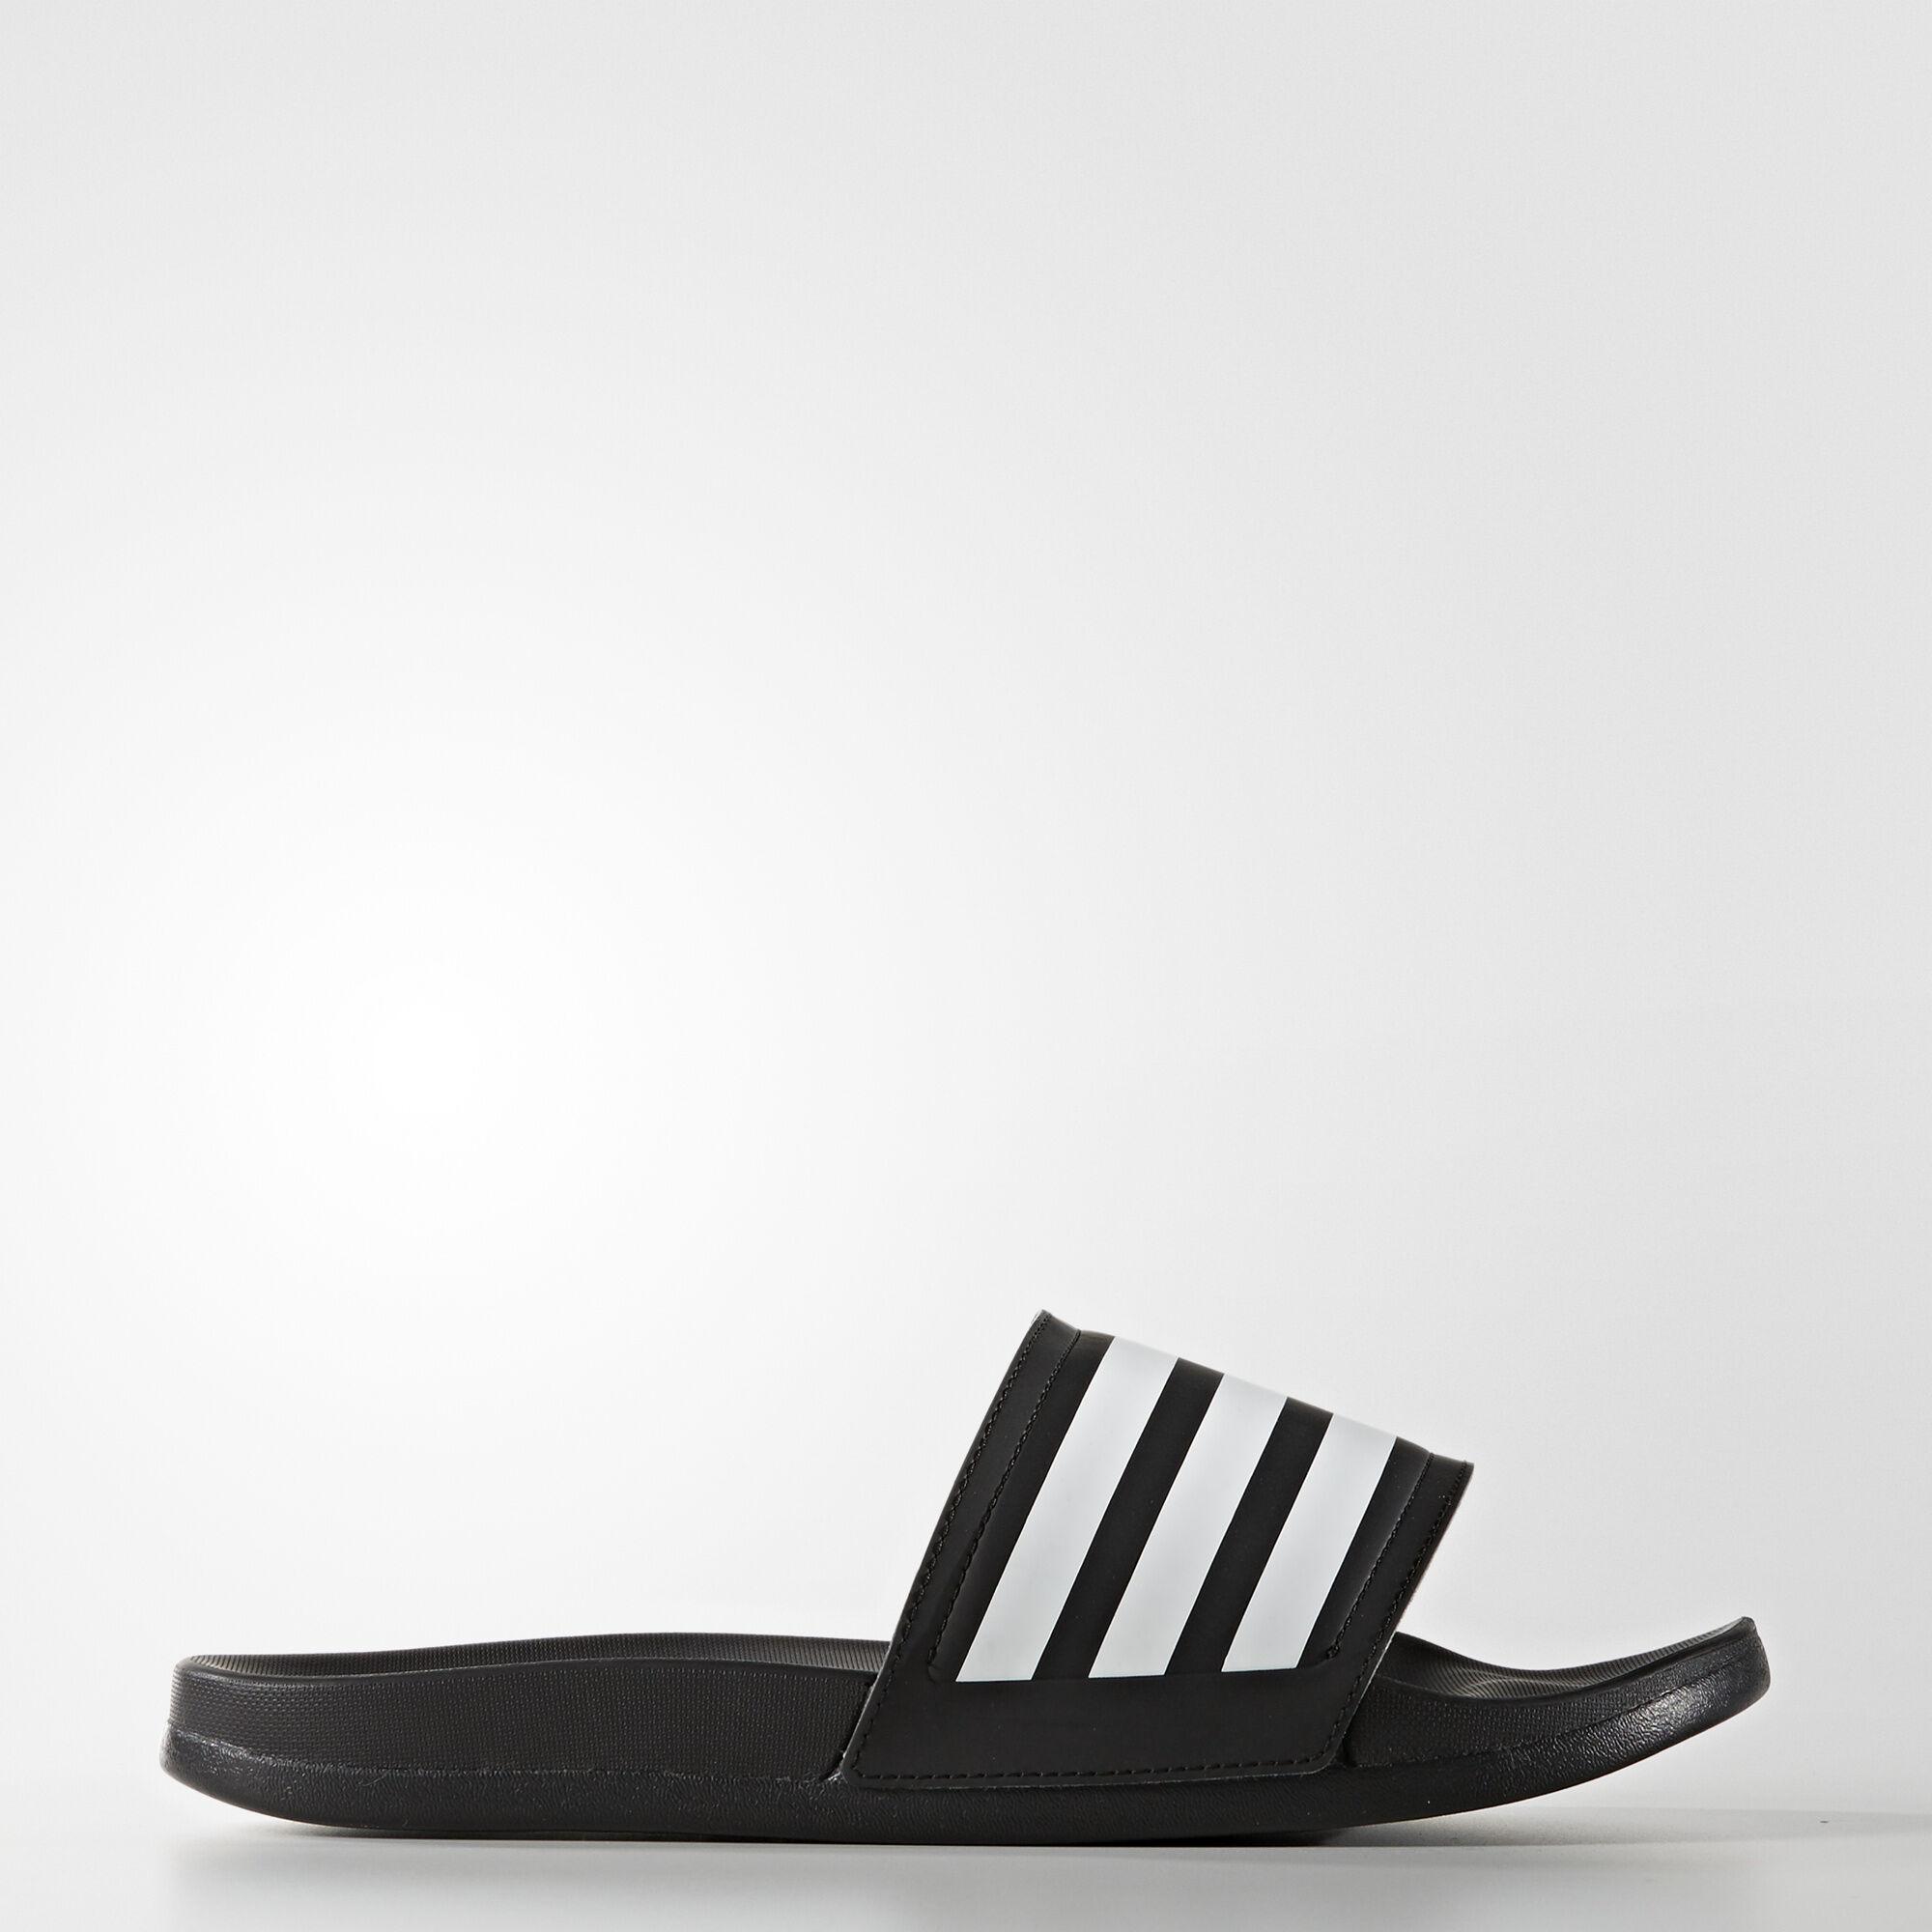 797c6cdb3092 ... Women s adidas - adilette Ultra Slides Core Black   Running White    Black BA9300 adidas - Supercloud Plus Flip-Flops ...